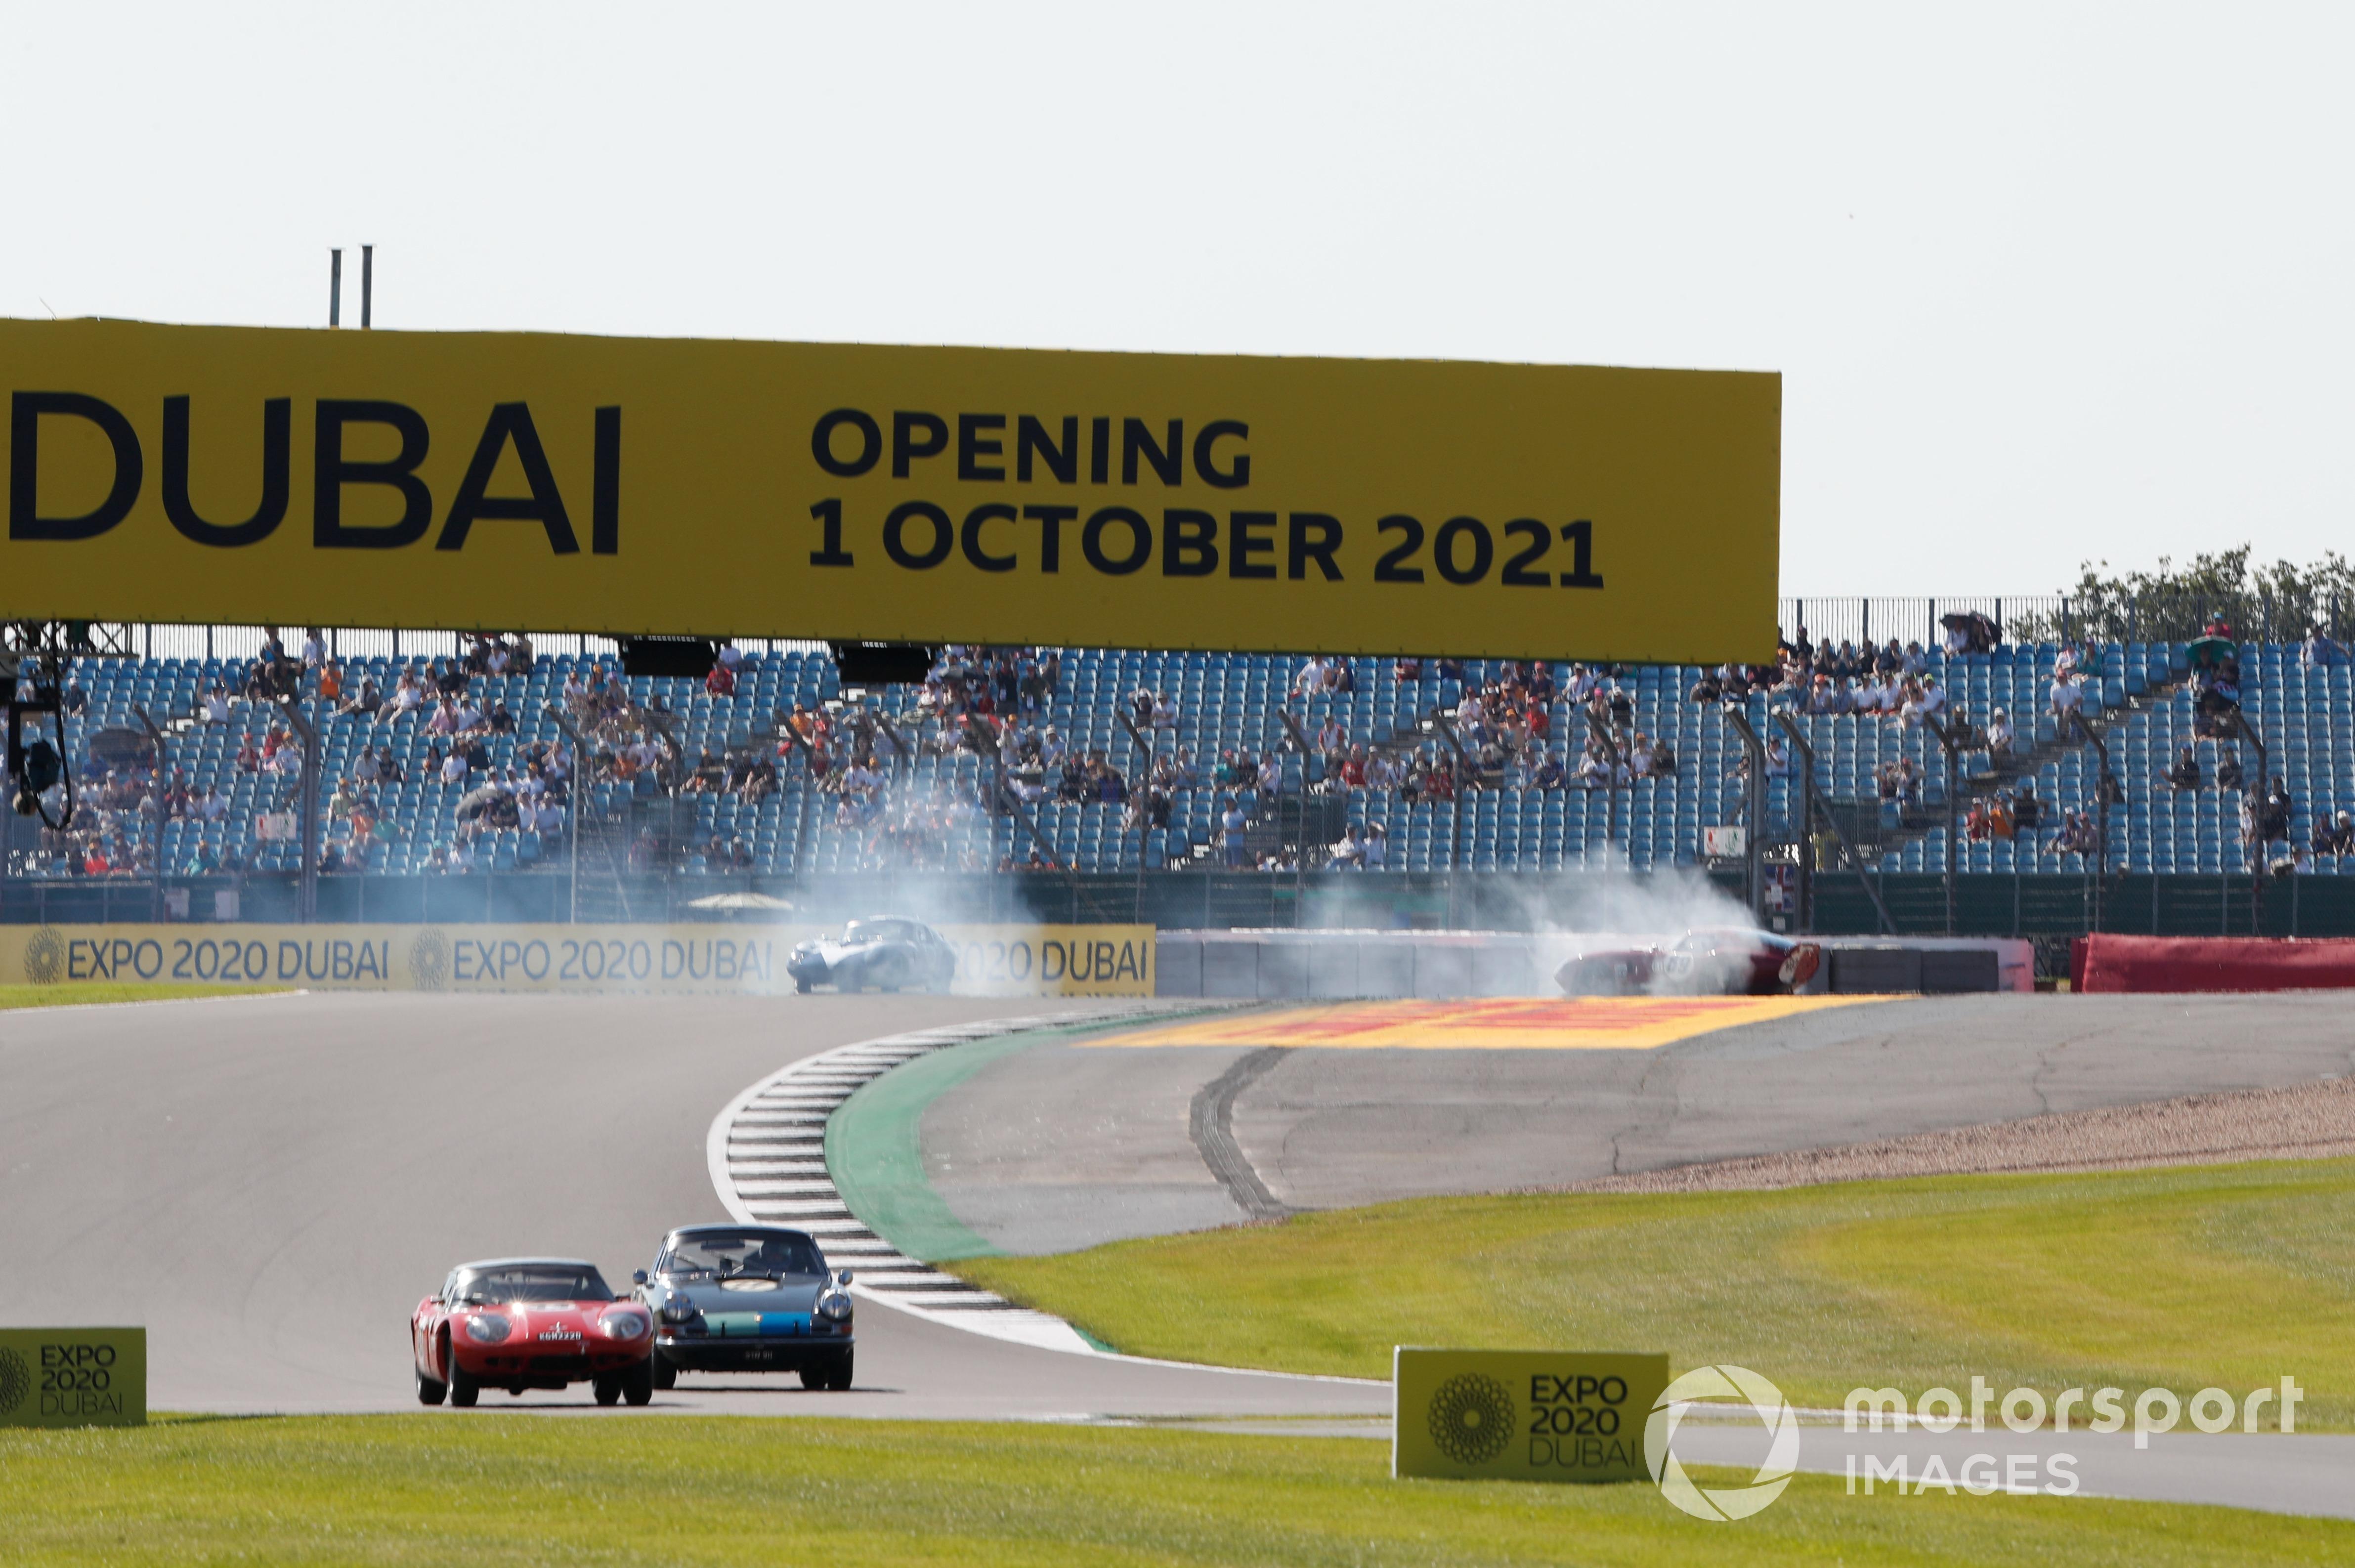 Julian Thomas and Andrew Jordan spin at Stowe, Silverstone British GP supports 2021